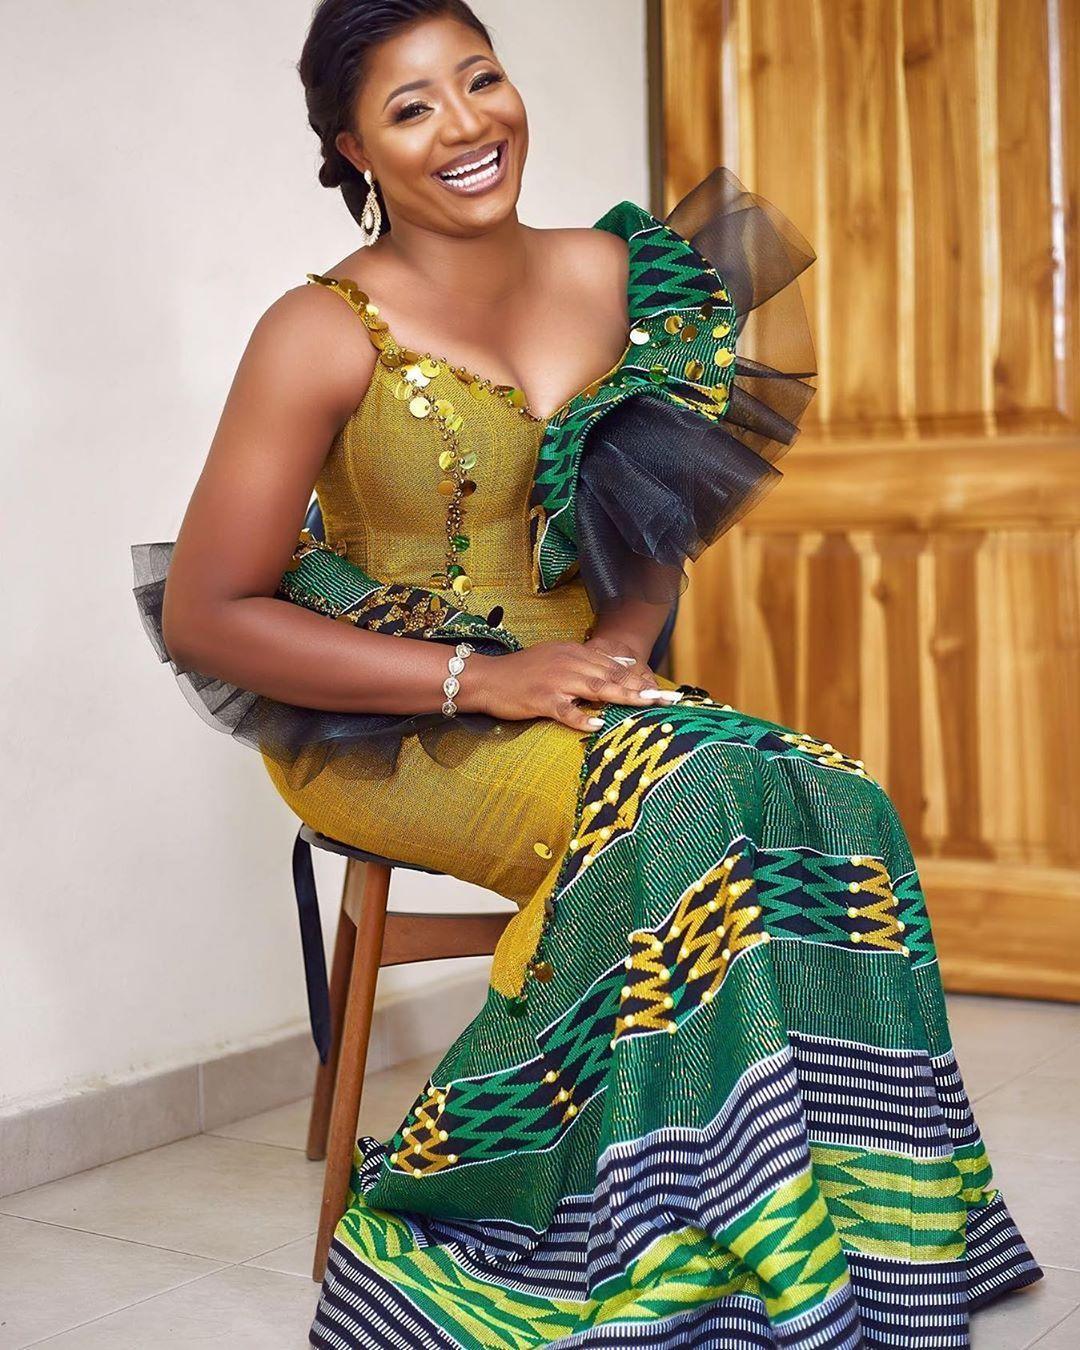 We Love Ghana Weddings On Instagram Nnaya Gh Engagement Gown Yoli Ko African Print Fashion Dresses African Clothing Styles African Design Dresses